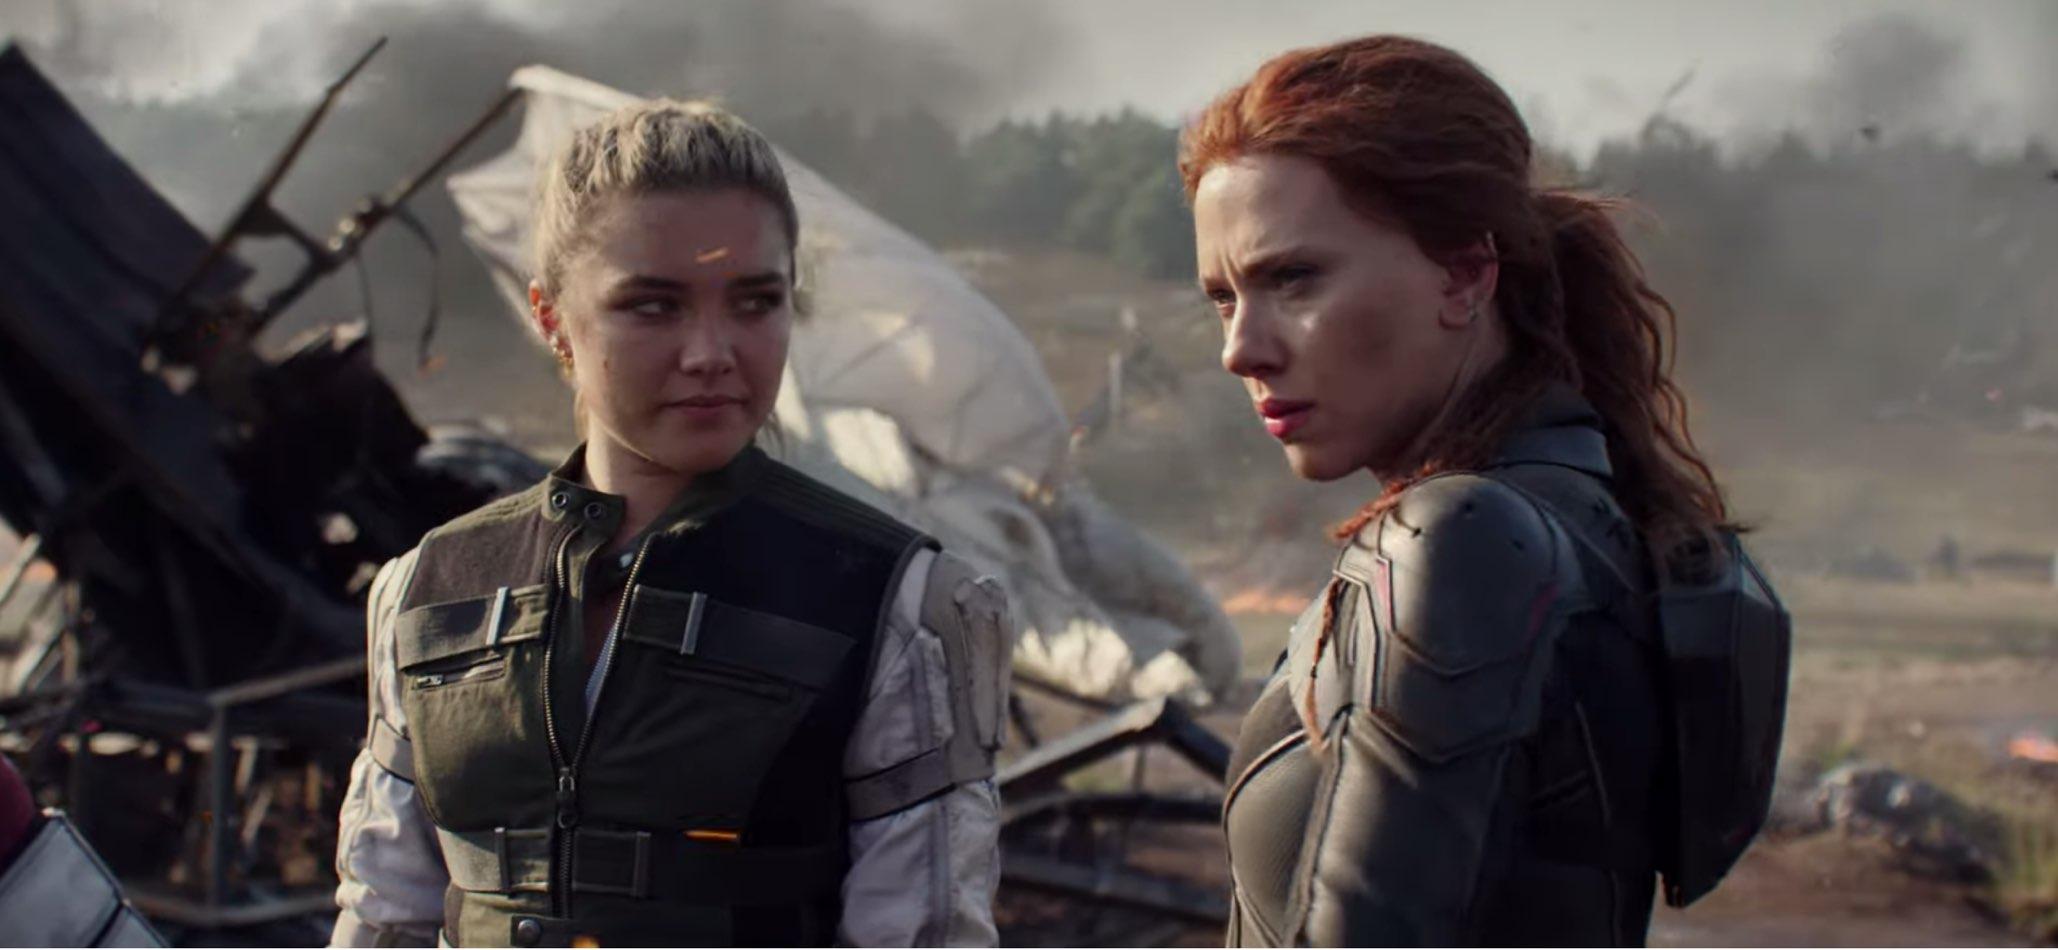 Black Widow' Super Bowl Trailer Shows Natasha's Superhero Family - Variety